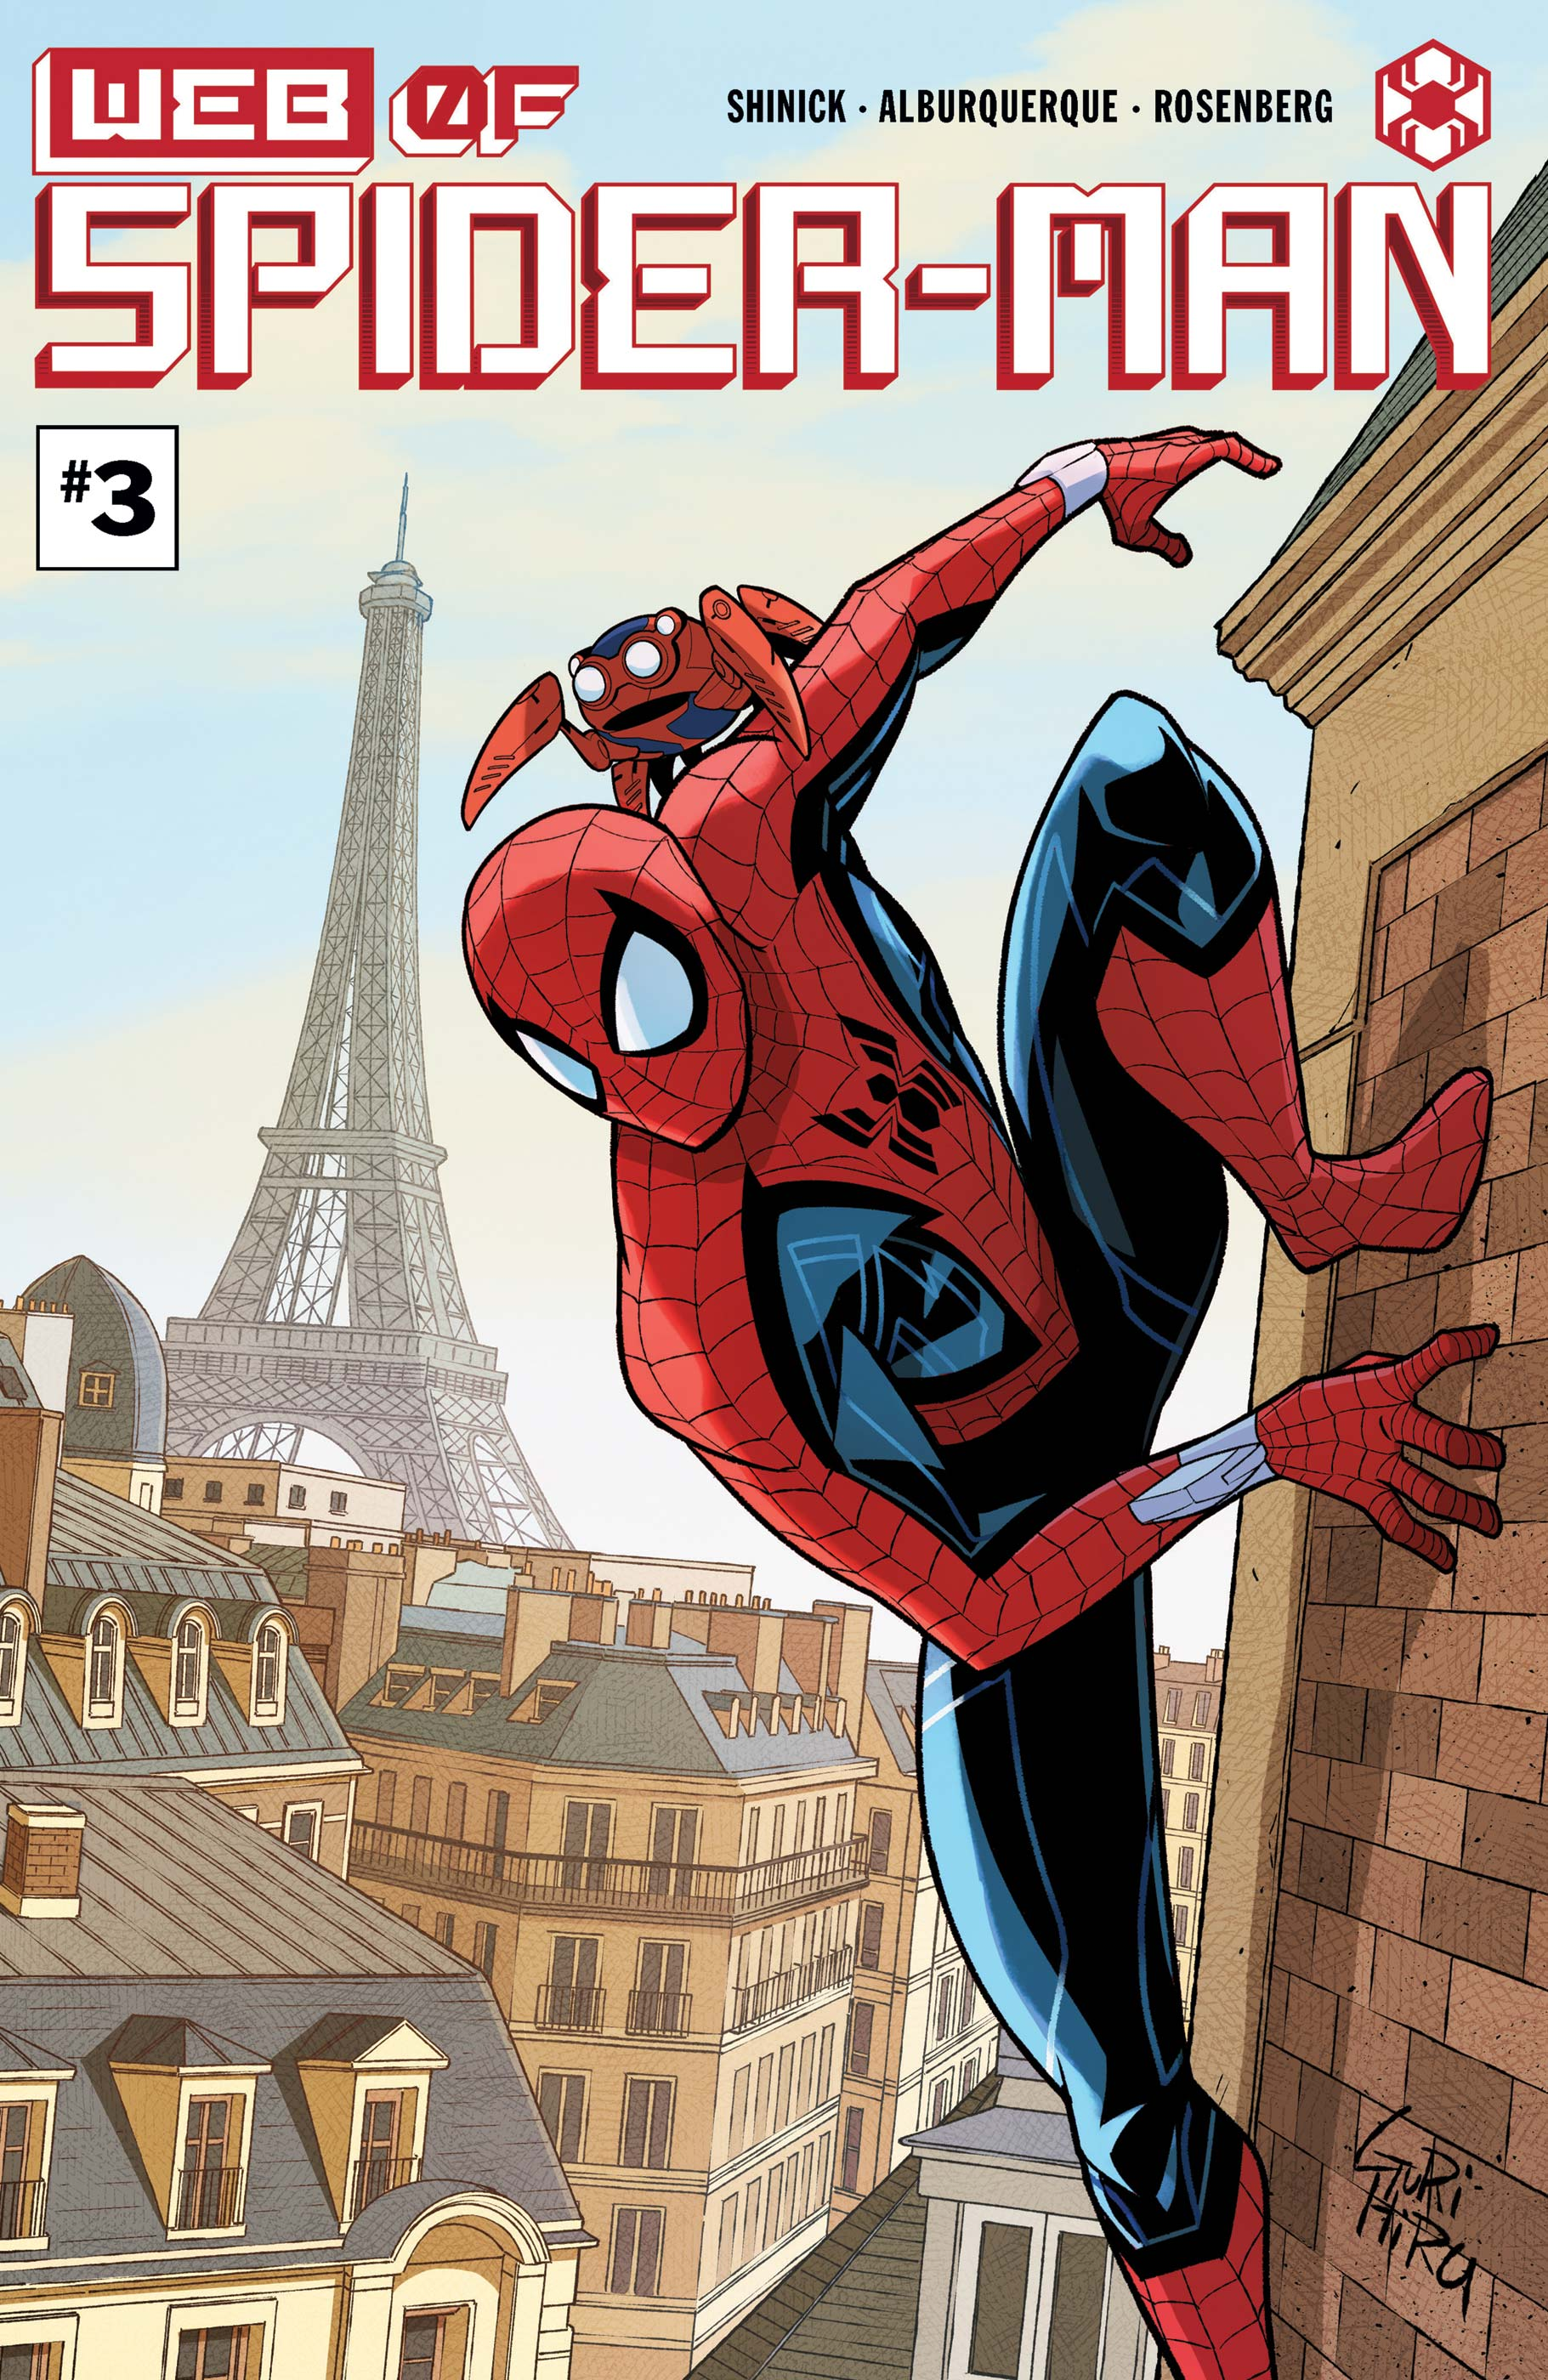 W.E.B. of Spider-Man (2021) #3